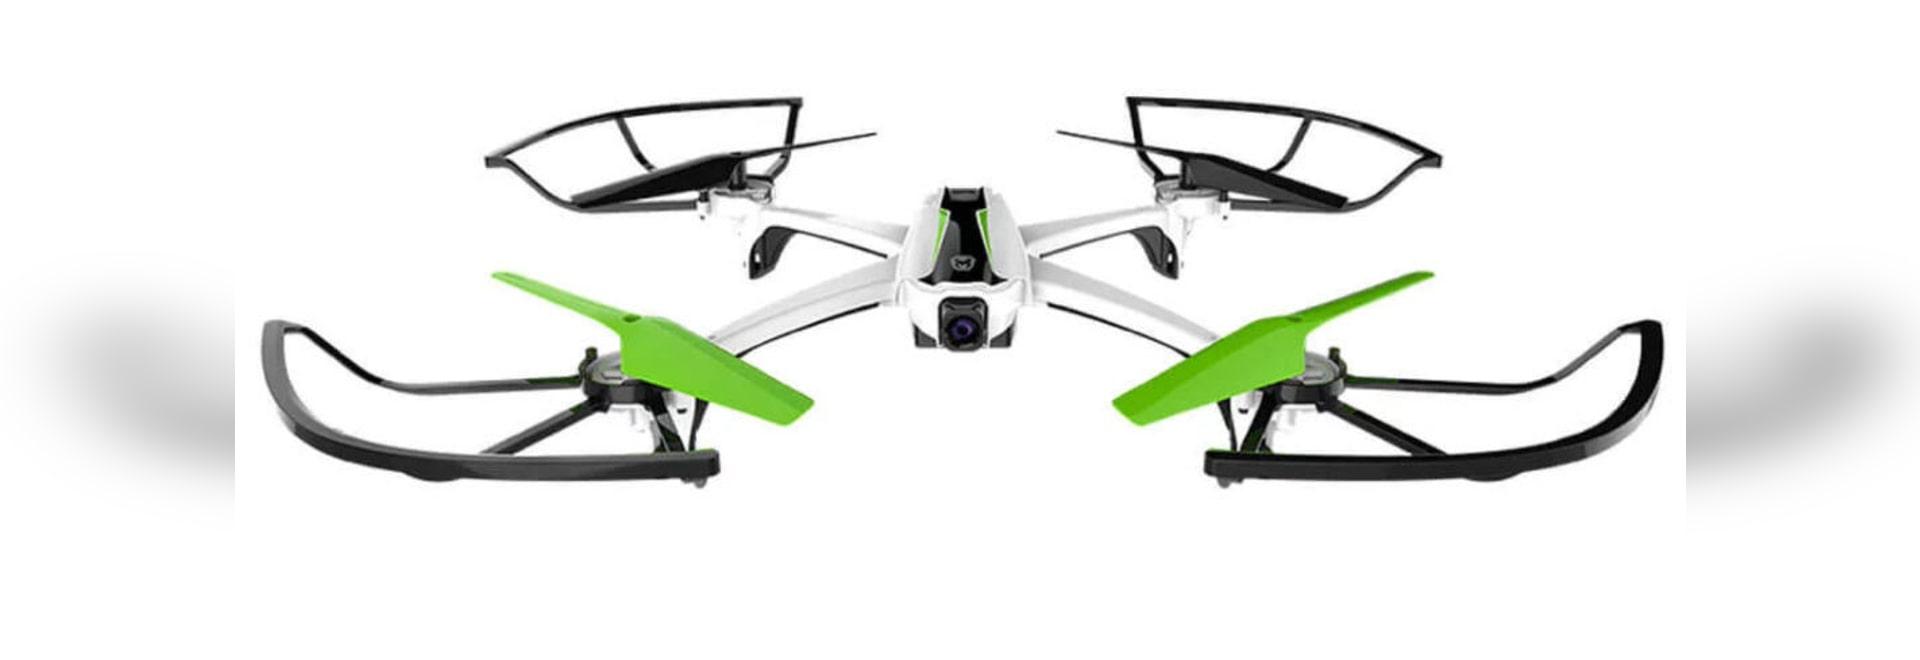 Skyrocket's Sky Viper Drones Fly Into The Holiday Season With New Sky Viper V2450 GPS Drone